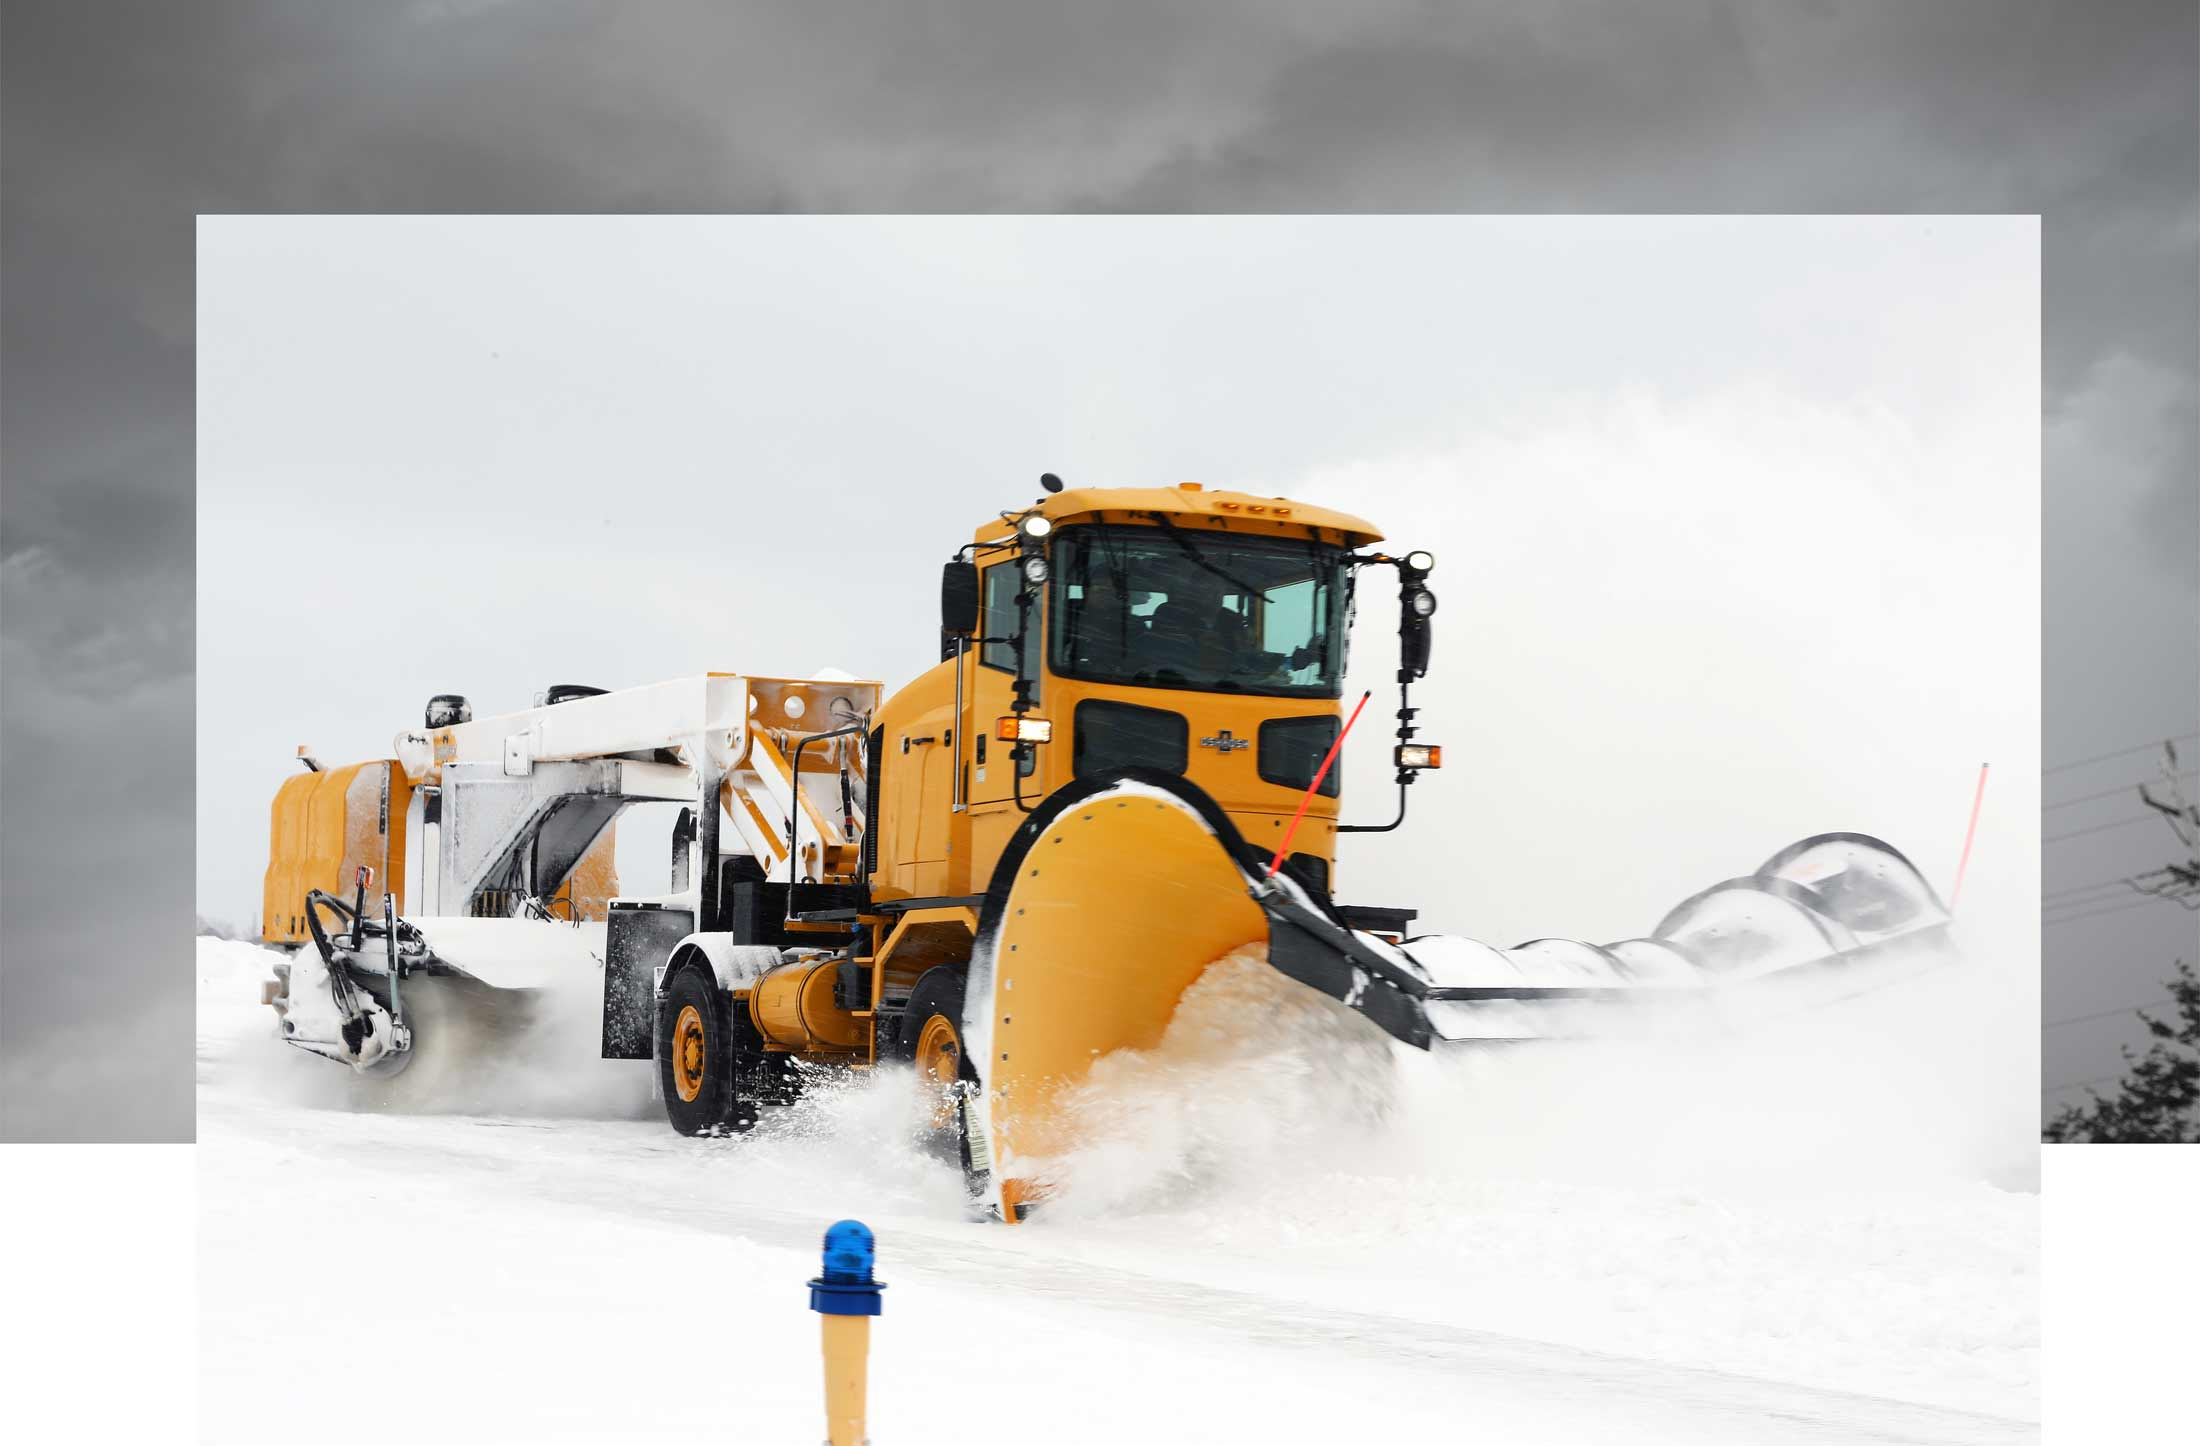 retouch_osh_snow_2